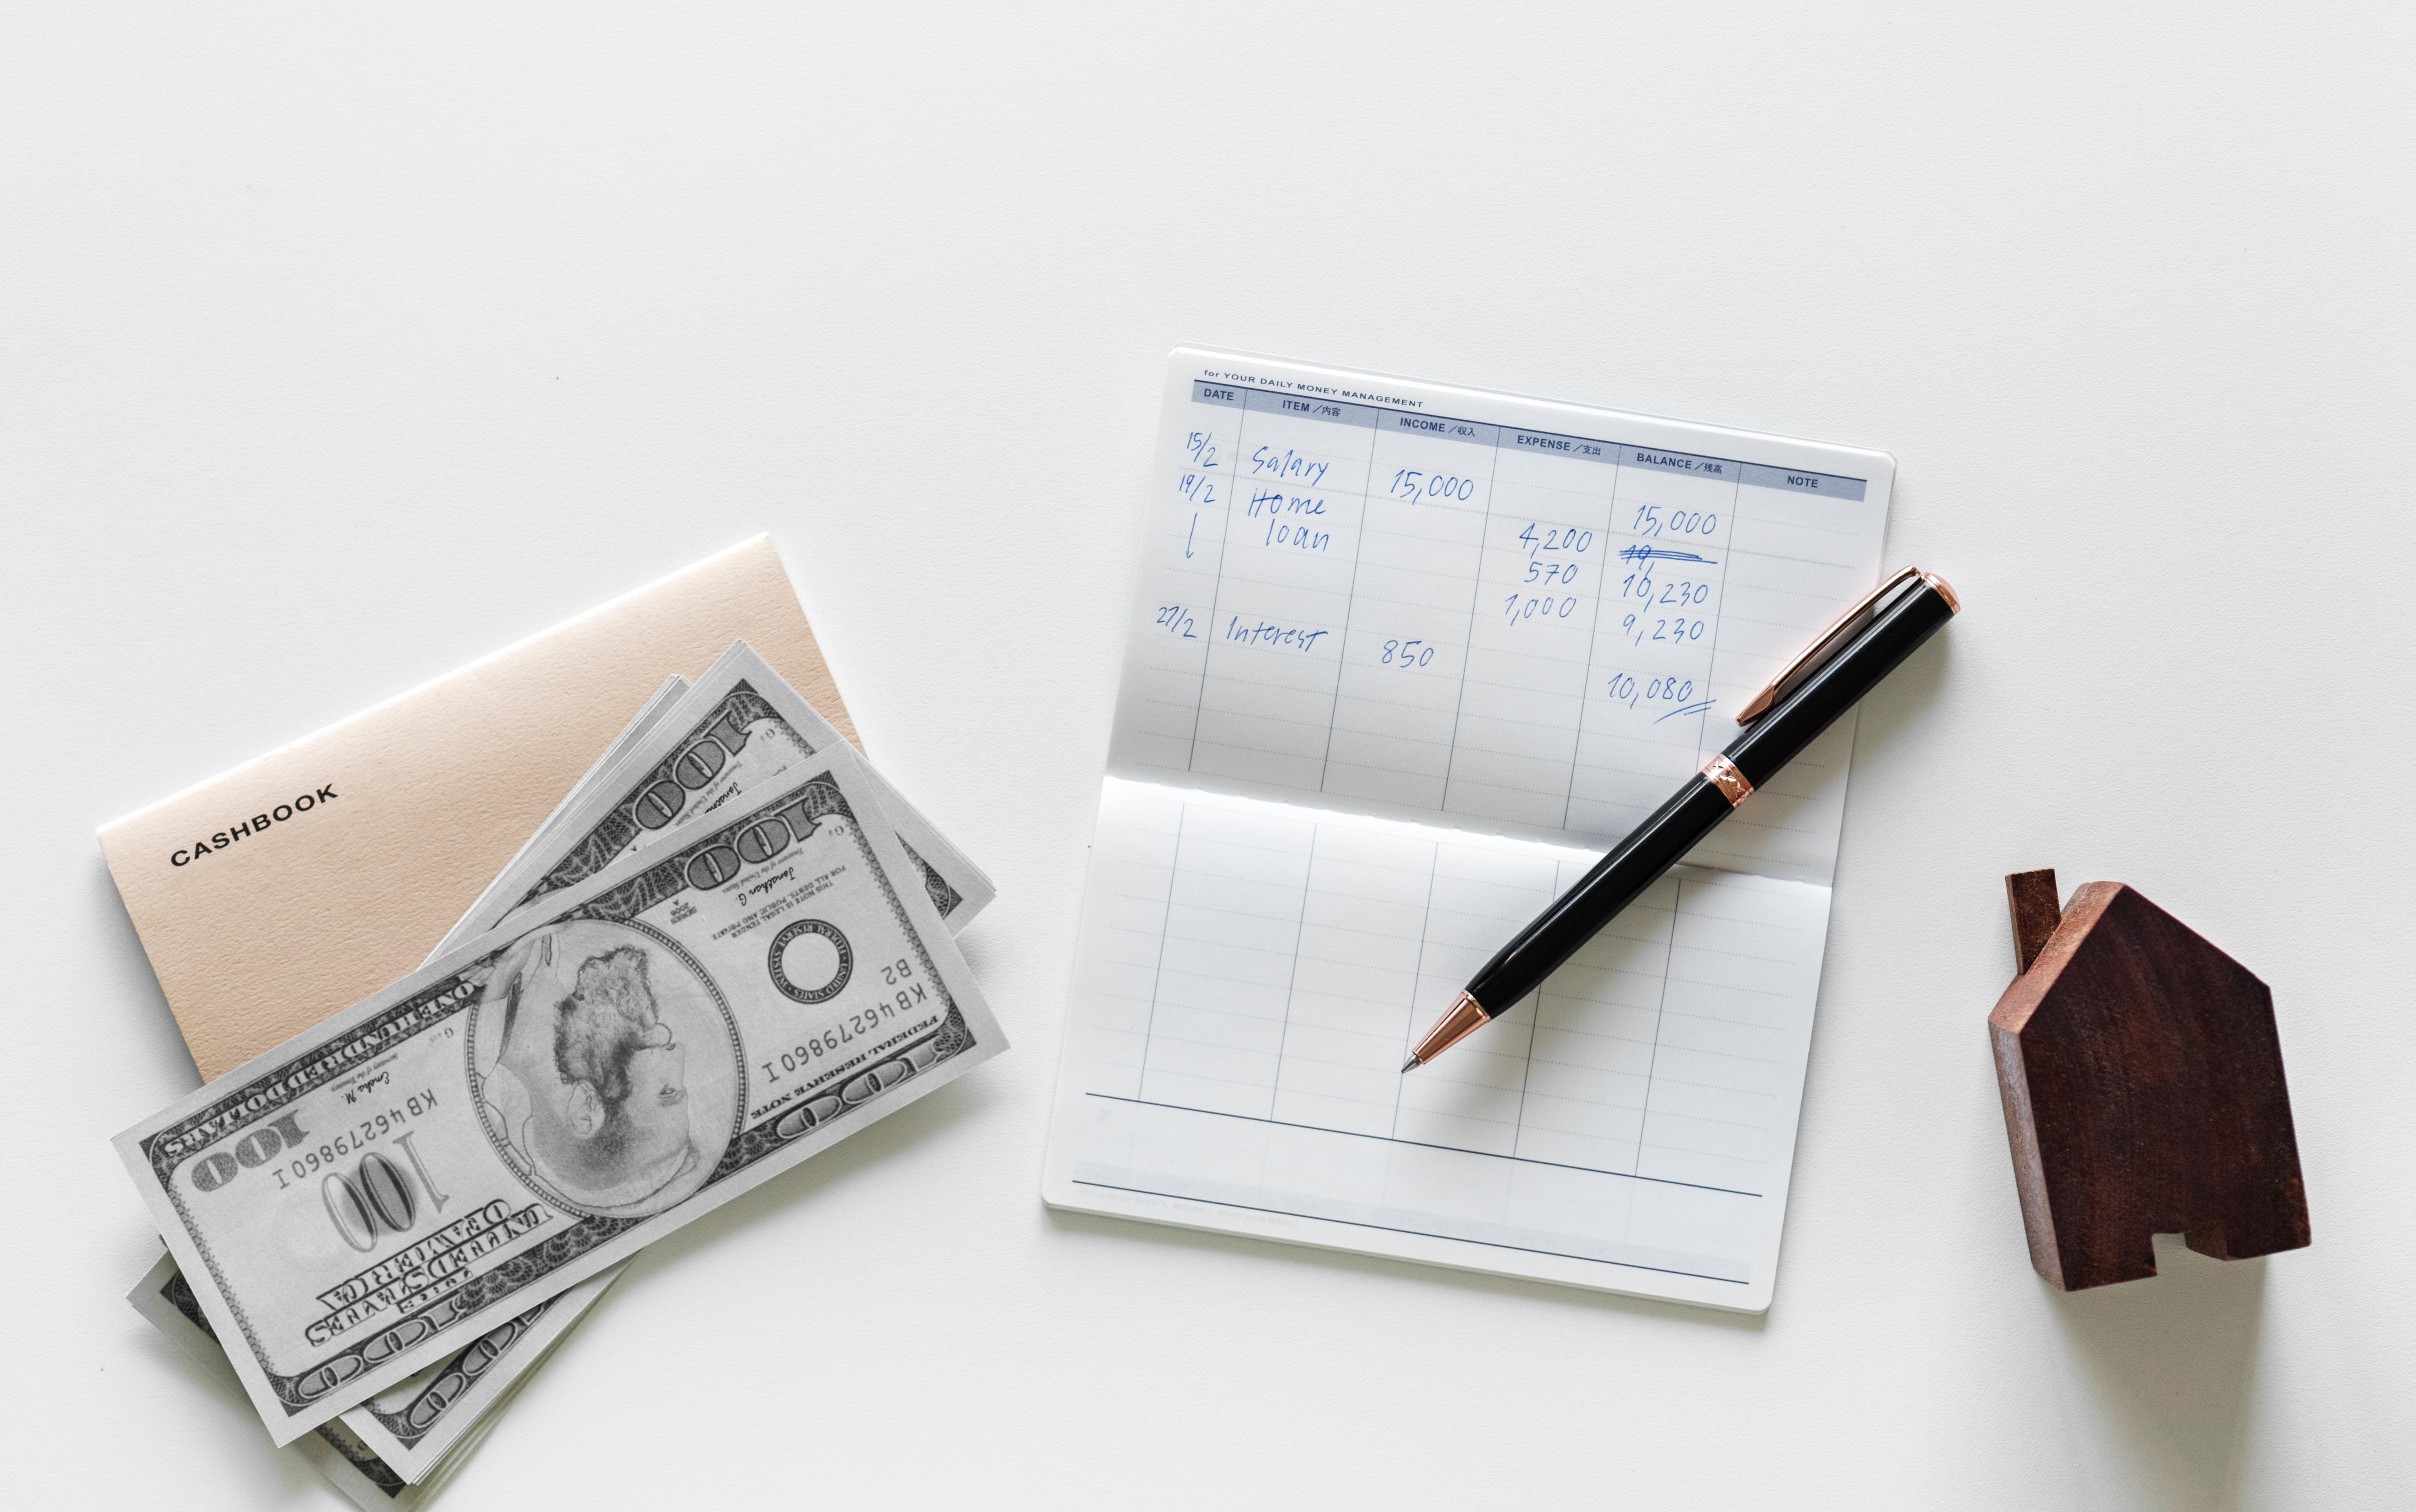 Help Munich Re design more financially inclusive insurance solutions